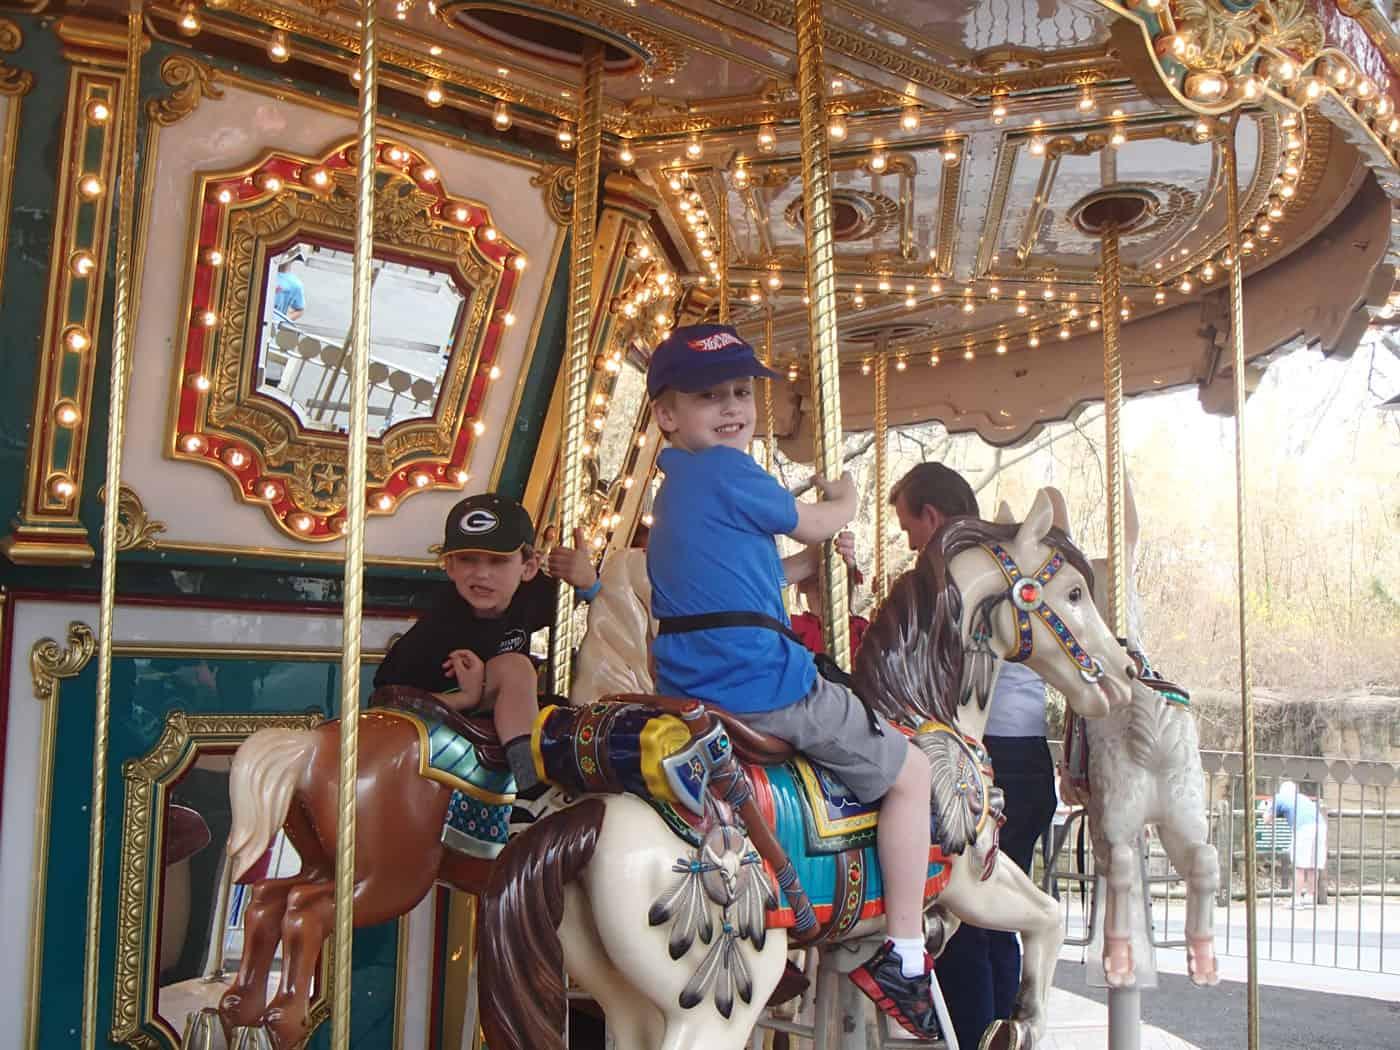 boys riding the carousel horses at Grant's Farm